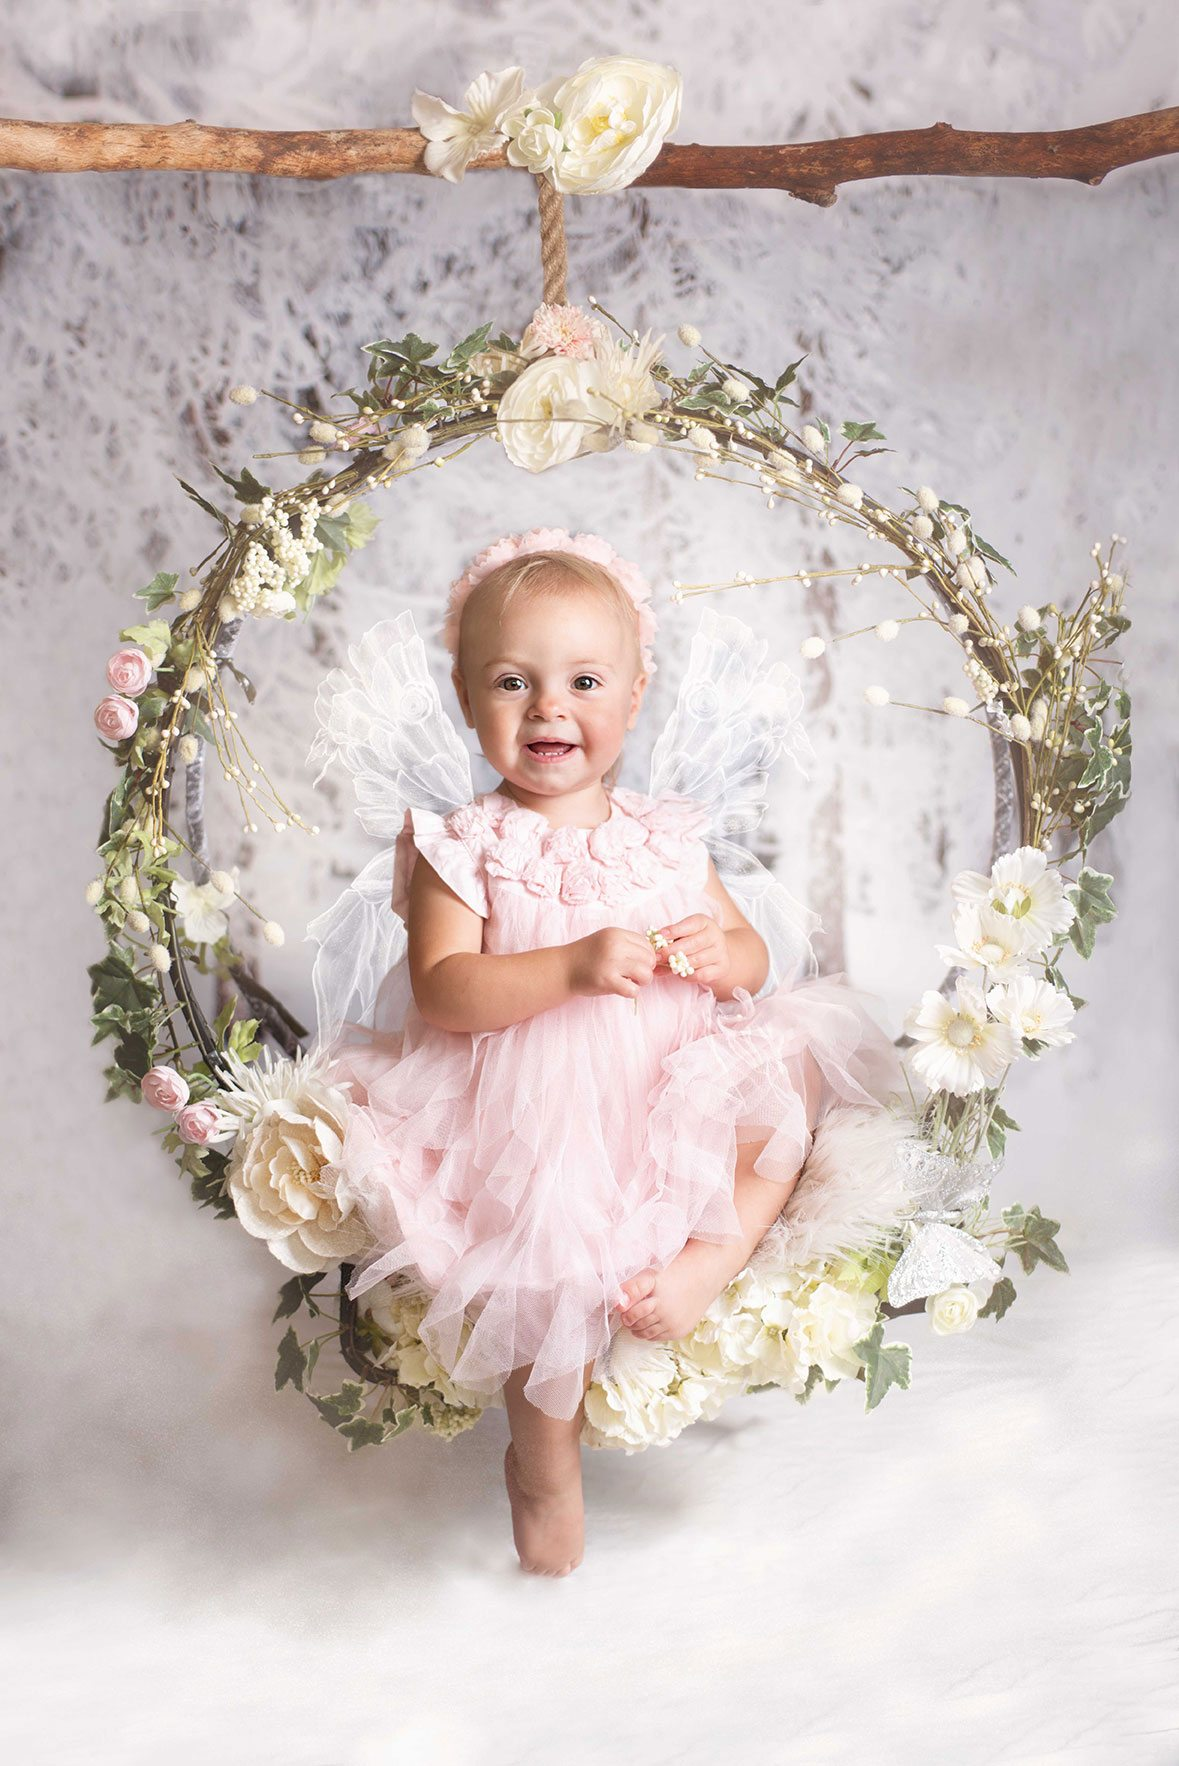 Snow fairy photo of little girl Essex Photographer